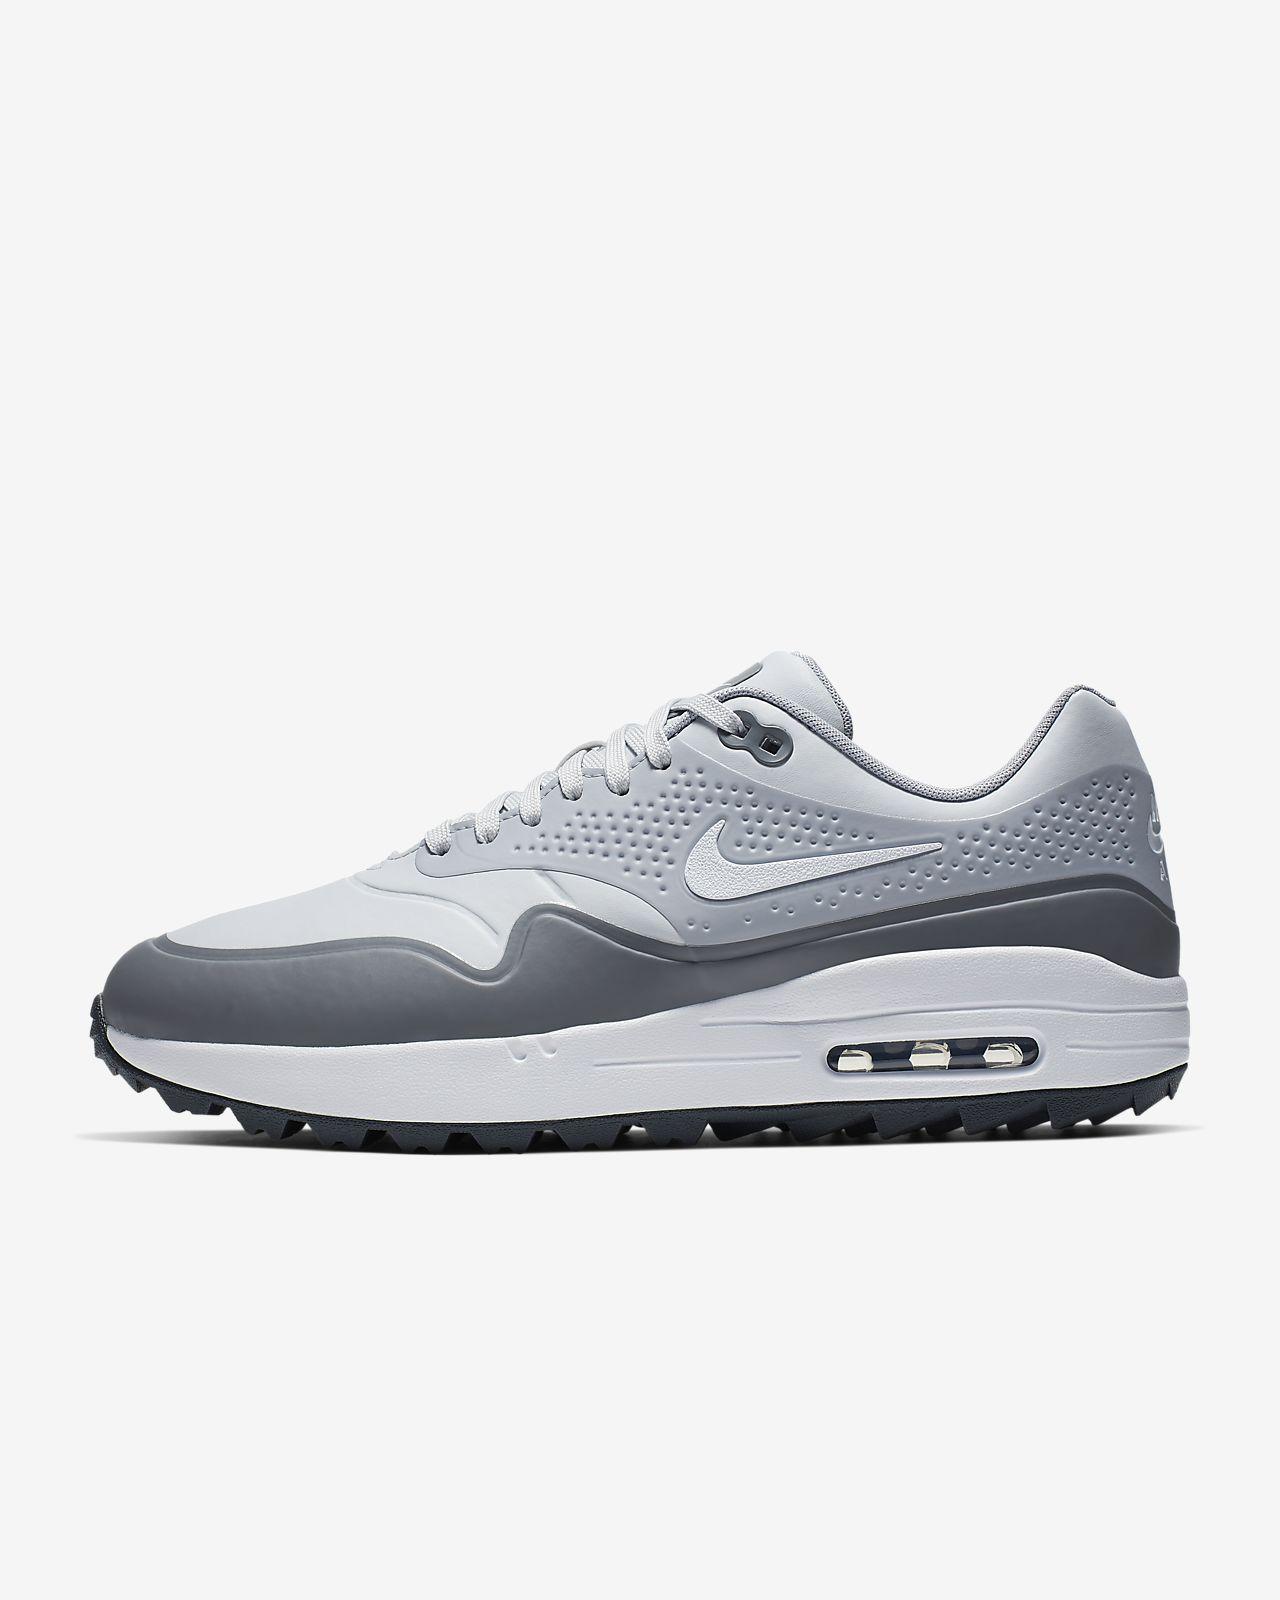 cheaper 5e5eb adcf3 Men s Golf Shoe. Nike Air Max 1 G